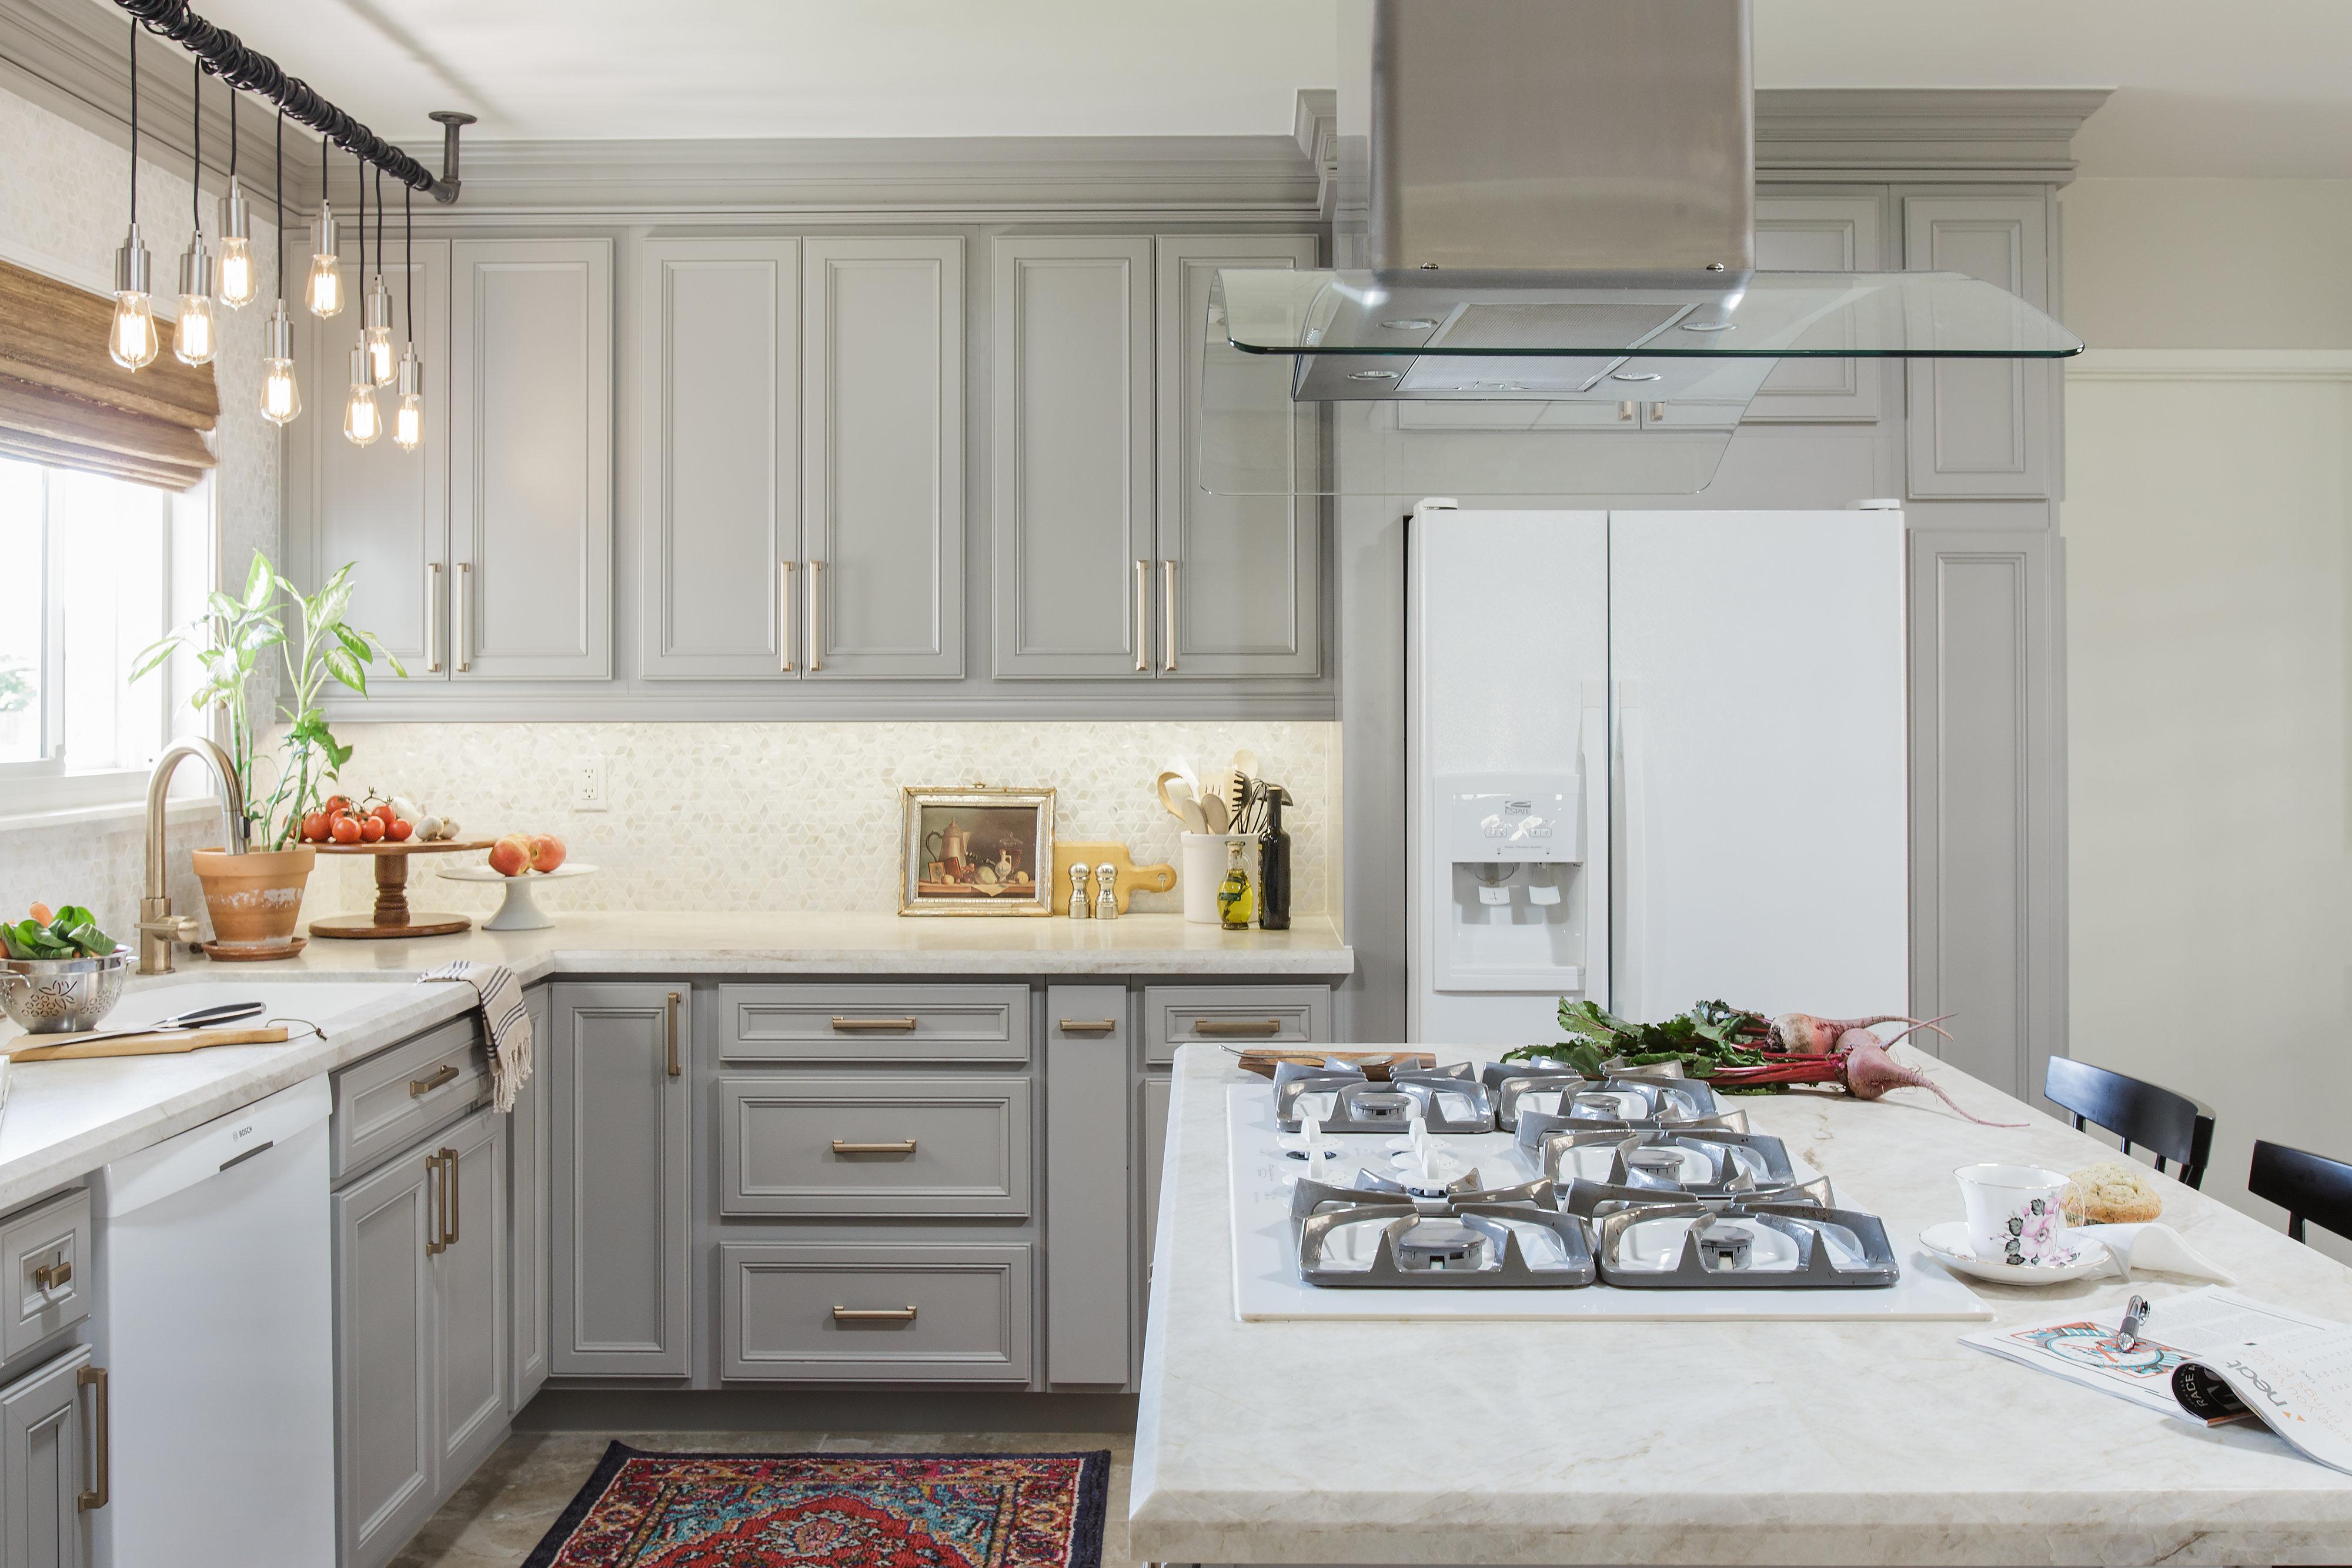 1_Gray Kitchen_white backsplash tile_San Diego_small spaces_Danielle Perkins_ Danielleidd